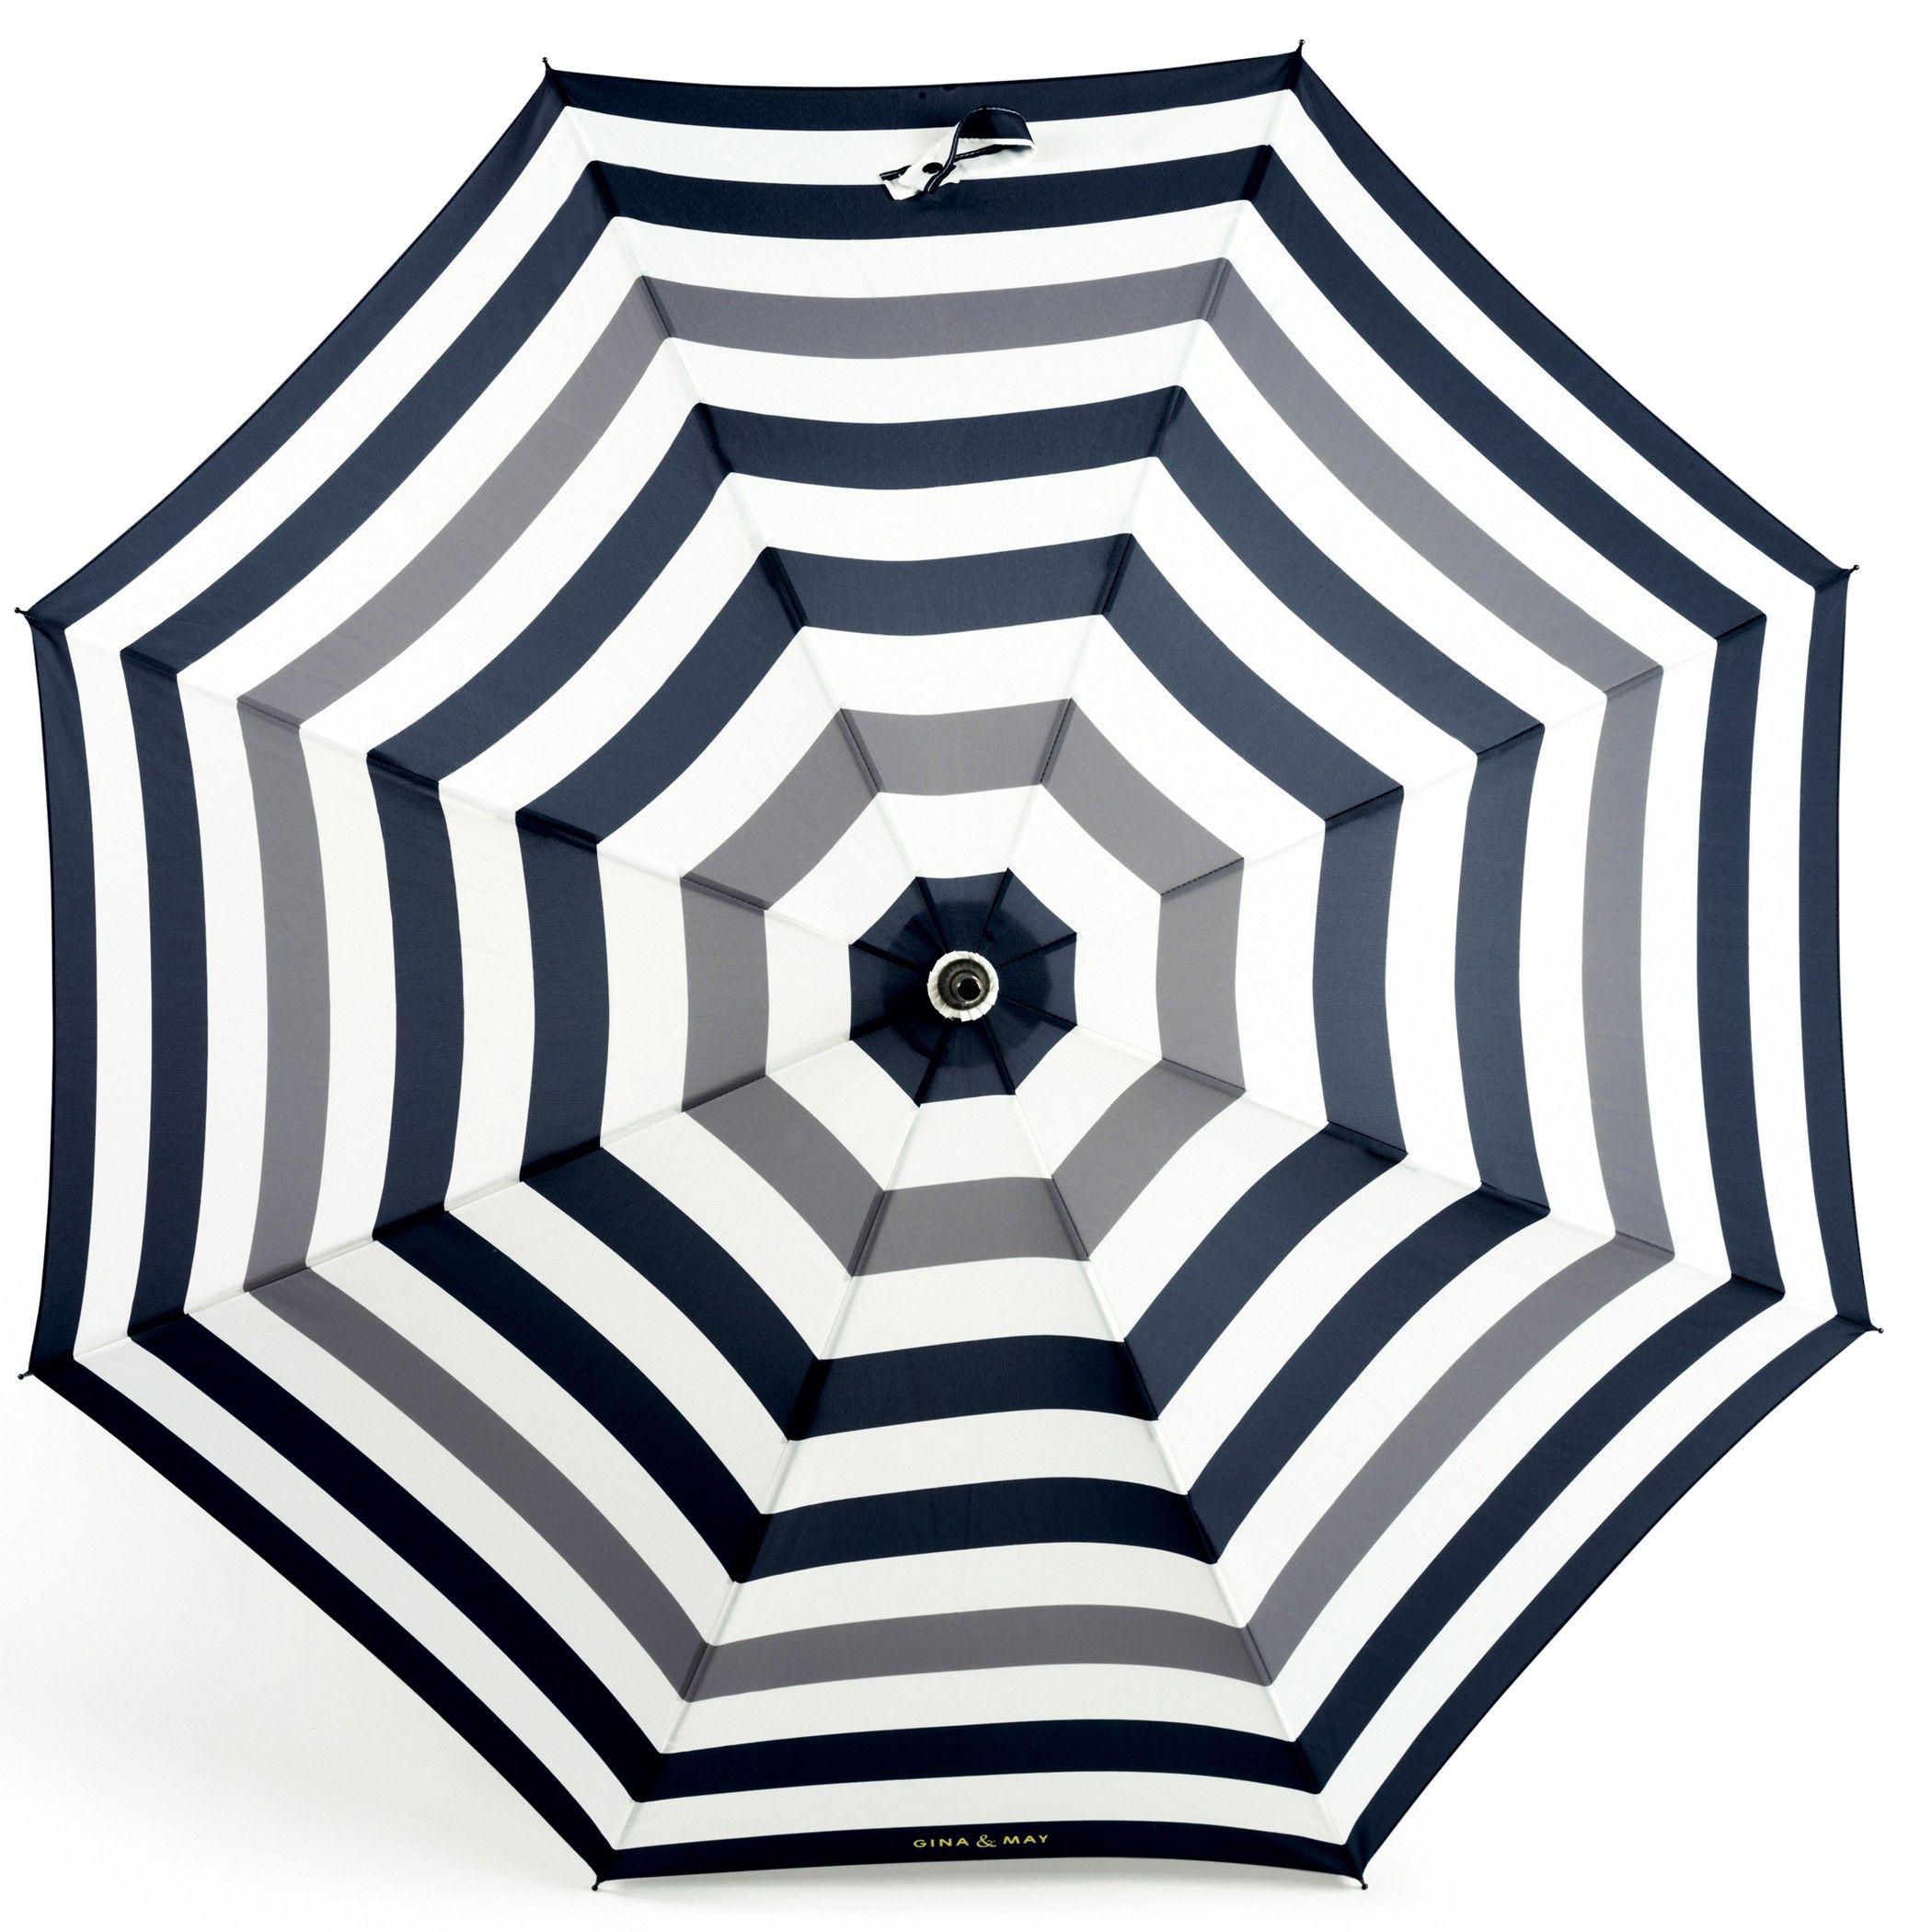 Gina & May | Designer Umbrella | Elephant Stripes Umbrella | Contemporary Art. Design Gifts. Ideas. | Everything Begins